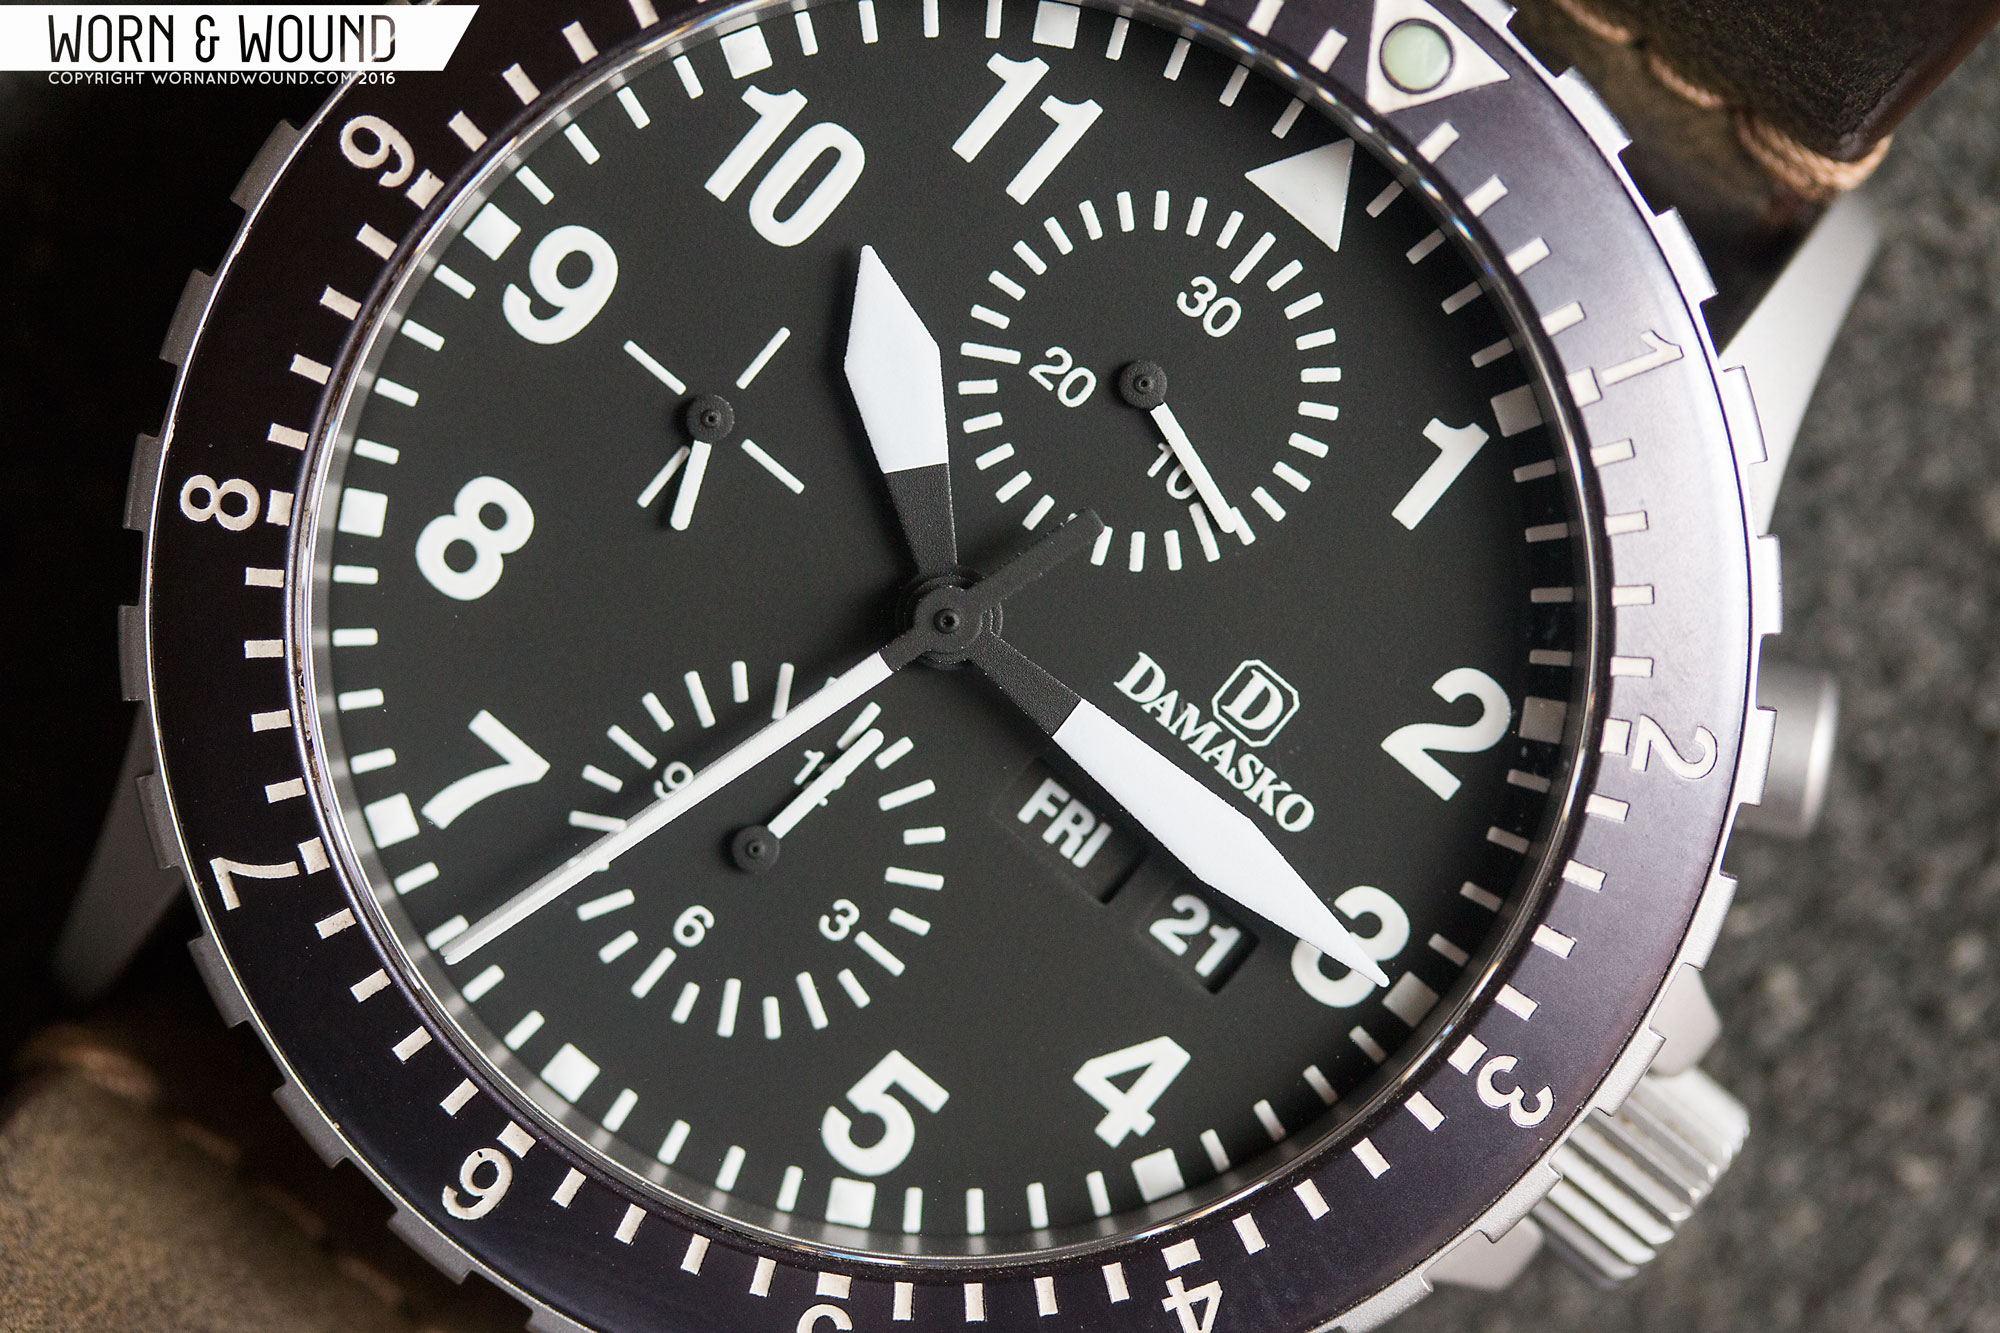 Replica damasko dc66 review best swiss watch replica online for Damasko watches